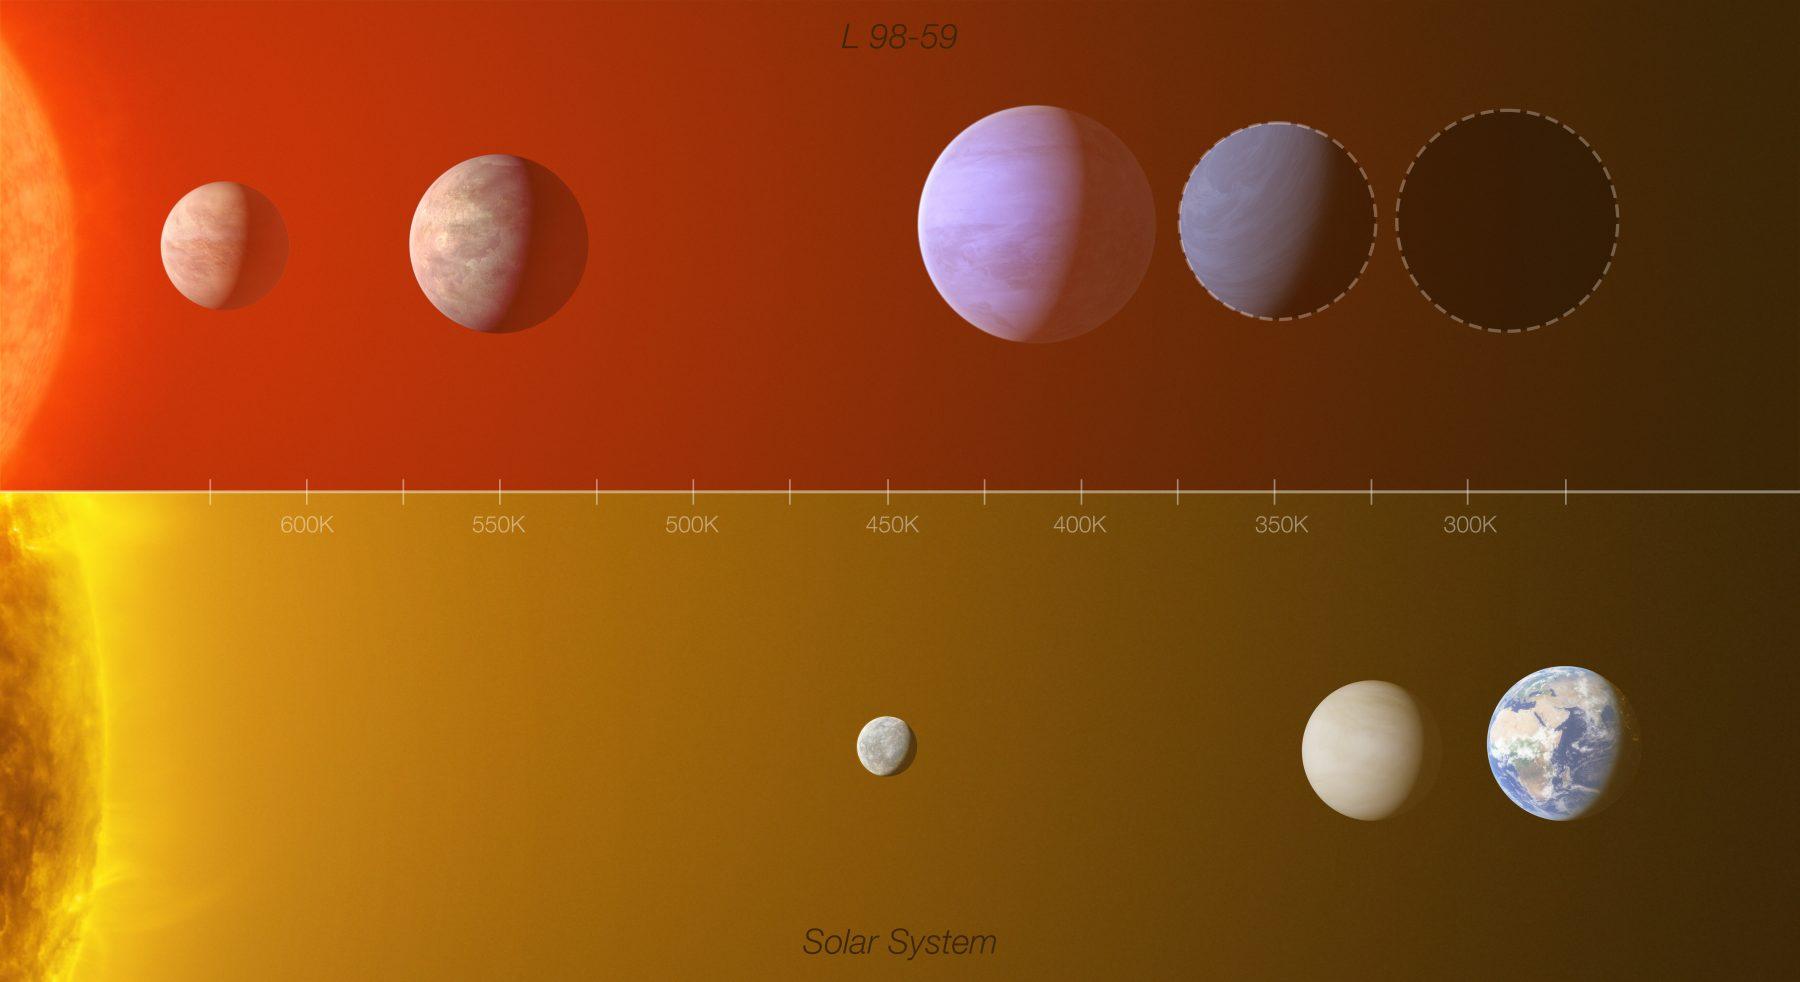 Comparison of the L 98-59 system and the solar system. Credit: ESO / L. Calçada, M. Kornmesser, O. Demangeon